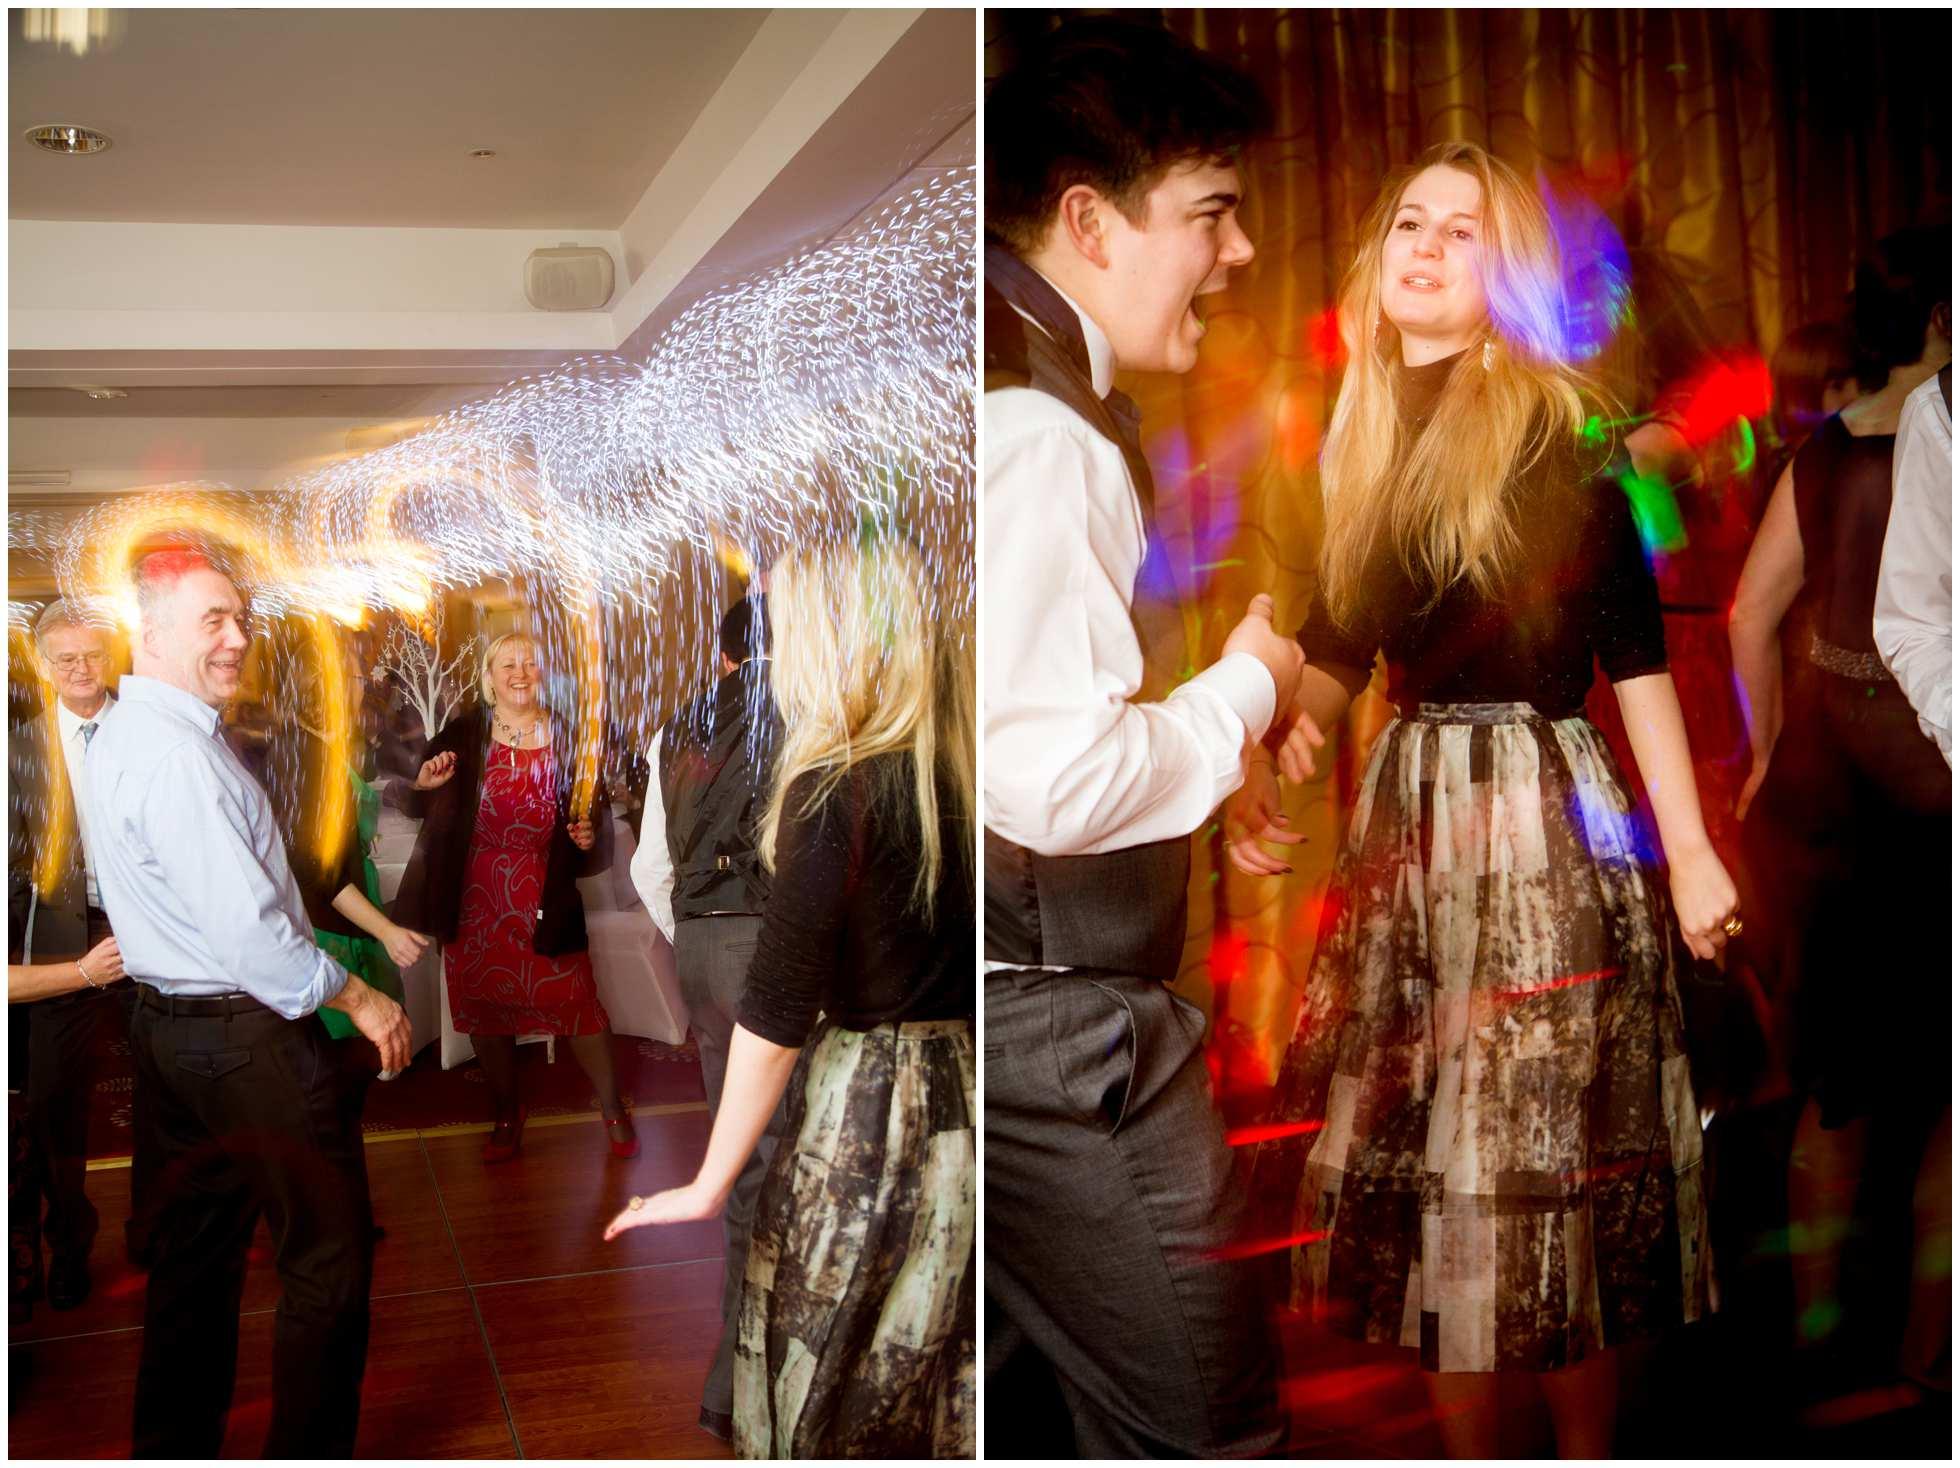 Long expose with flash dance floor shots